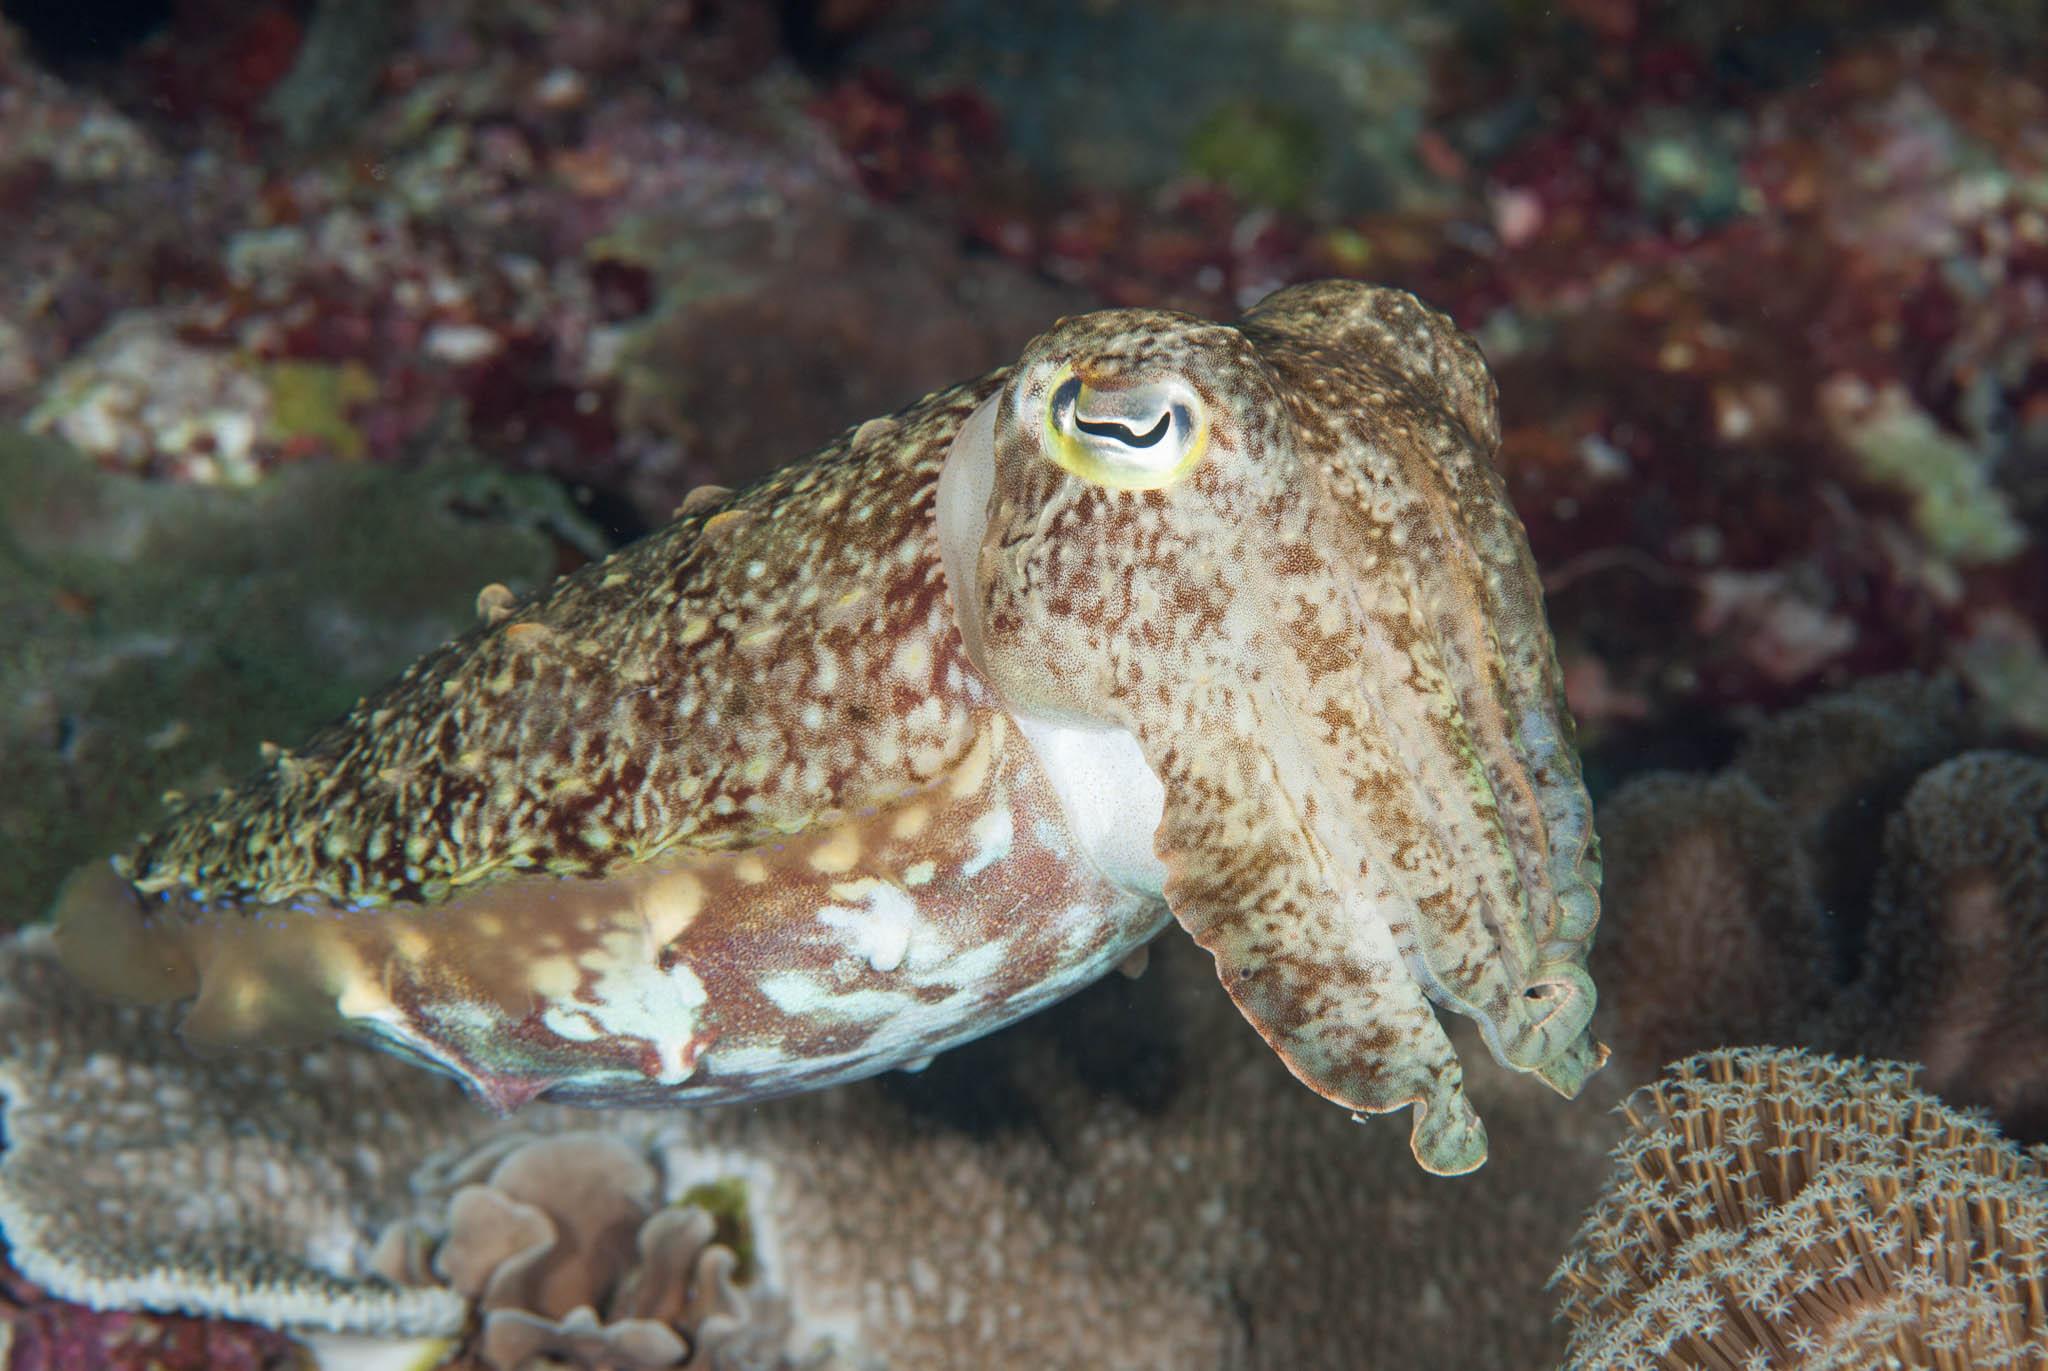 Broadband Cuttlefish